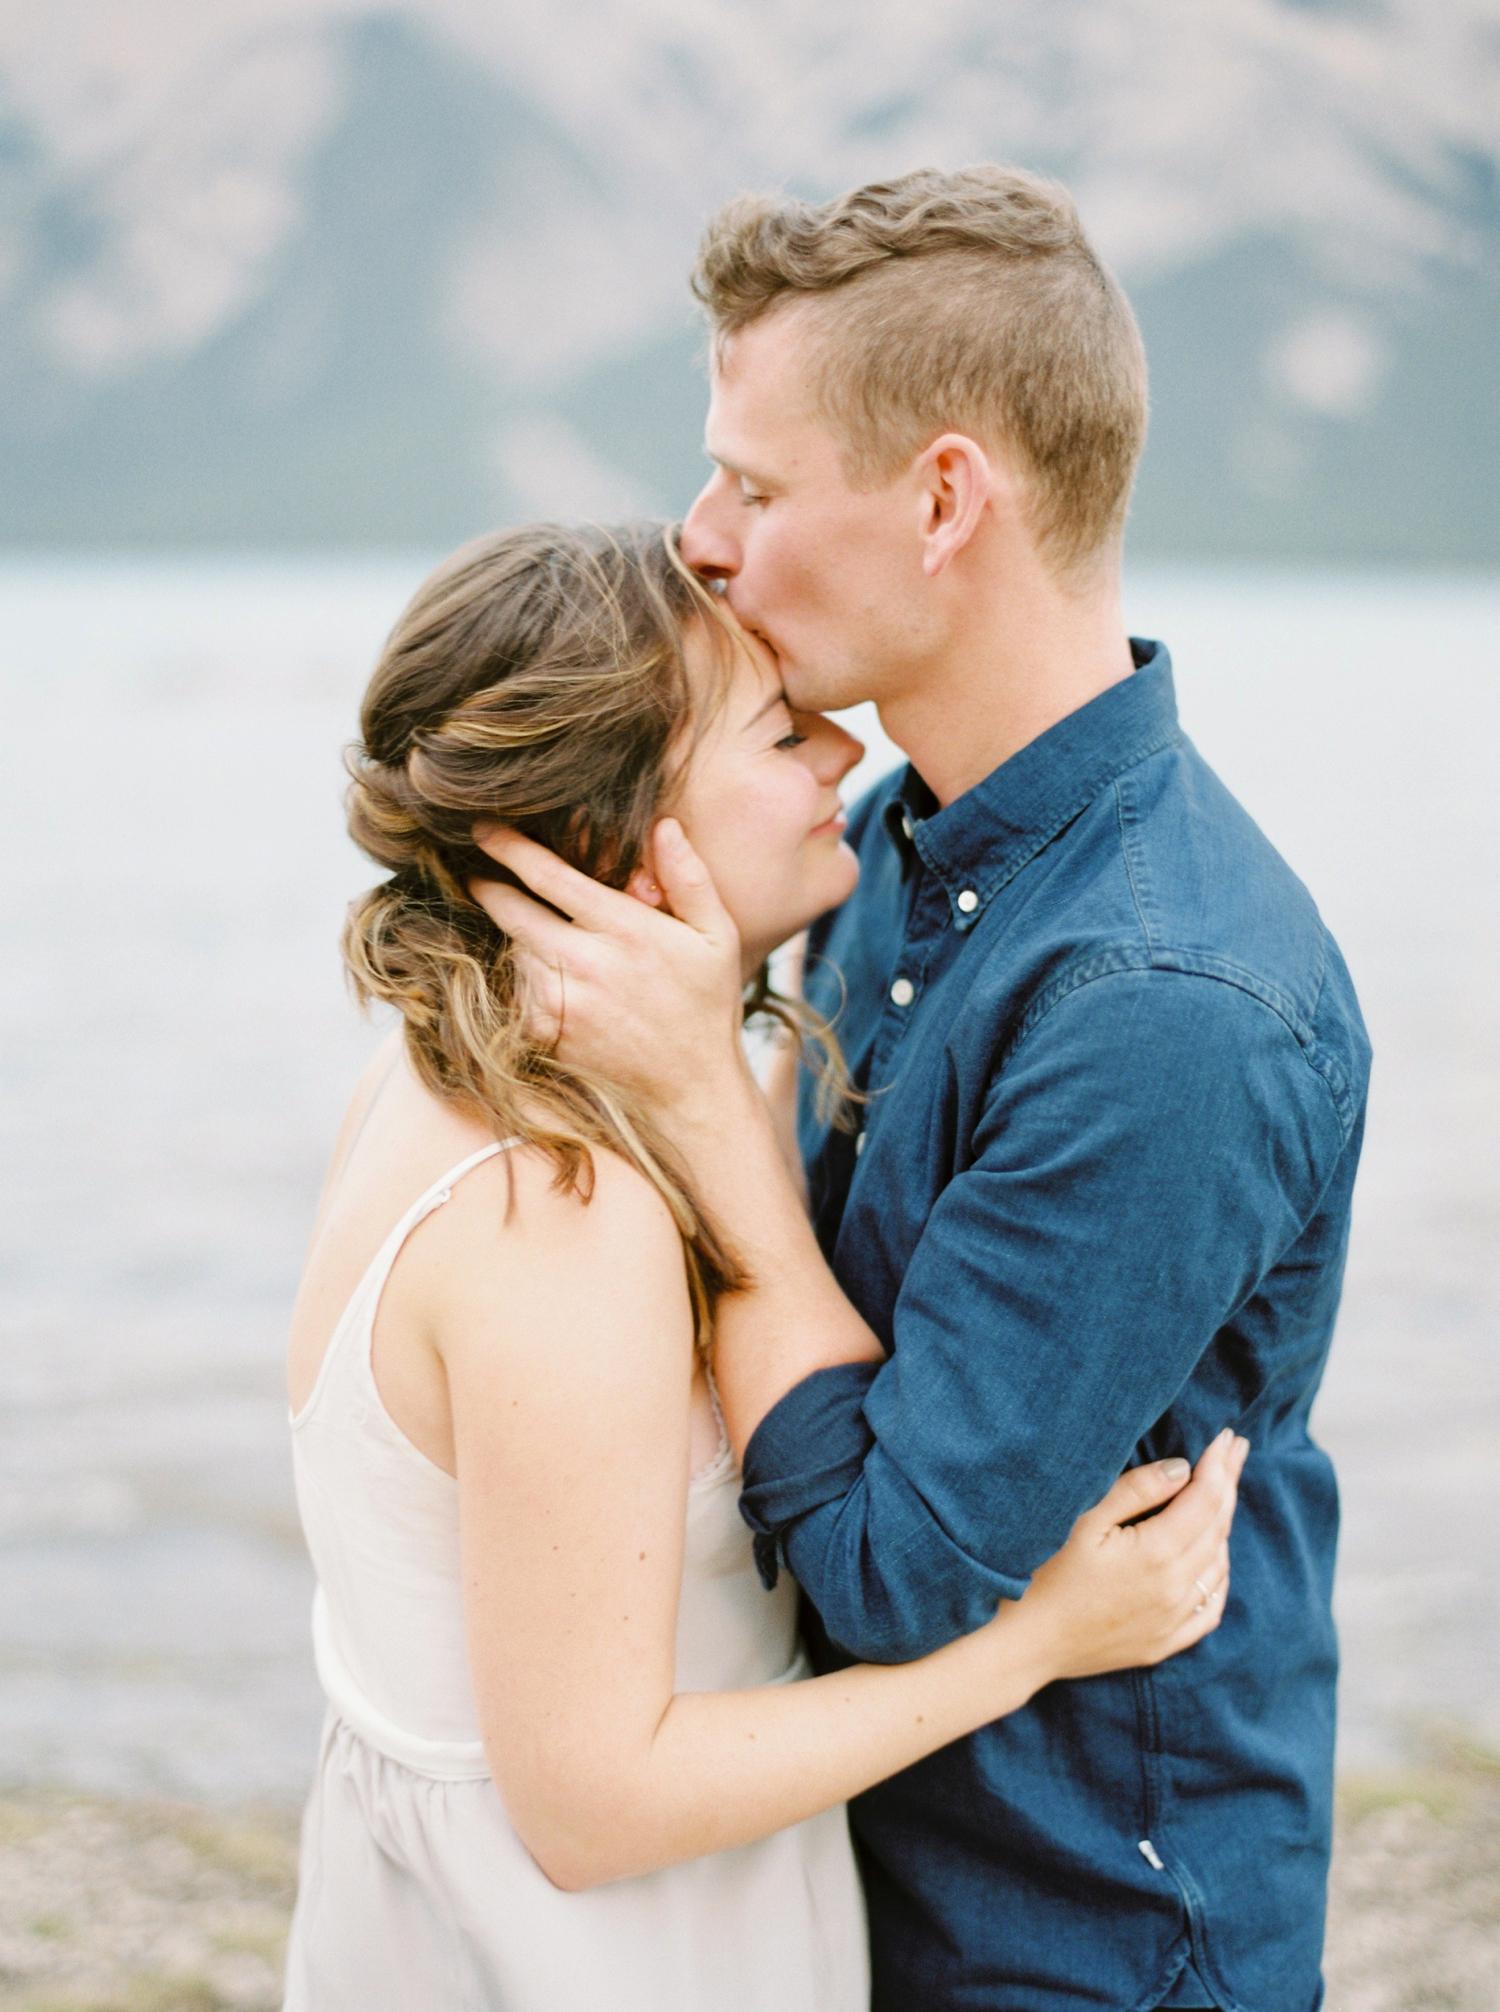 Banff Engagement Photographers | Banff Proposal Photography | Justine Milton